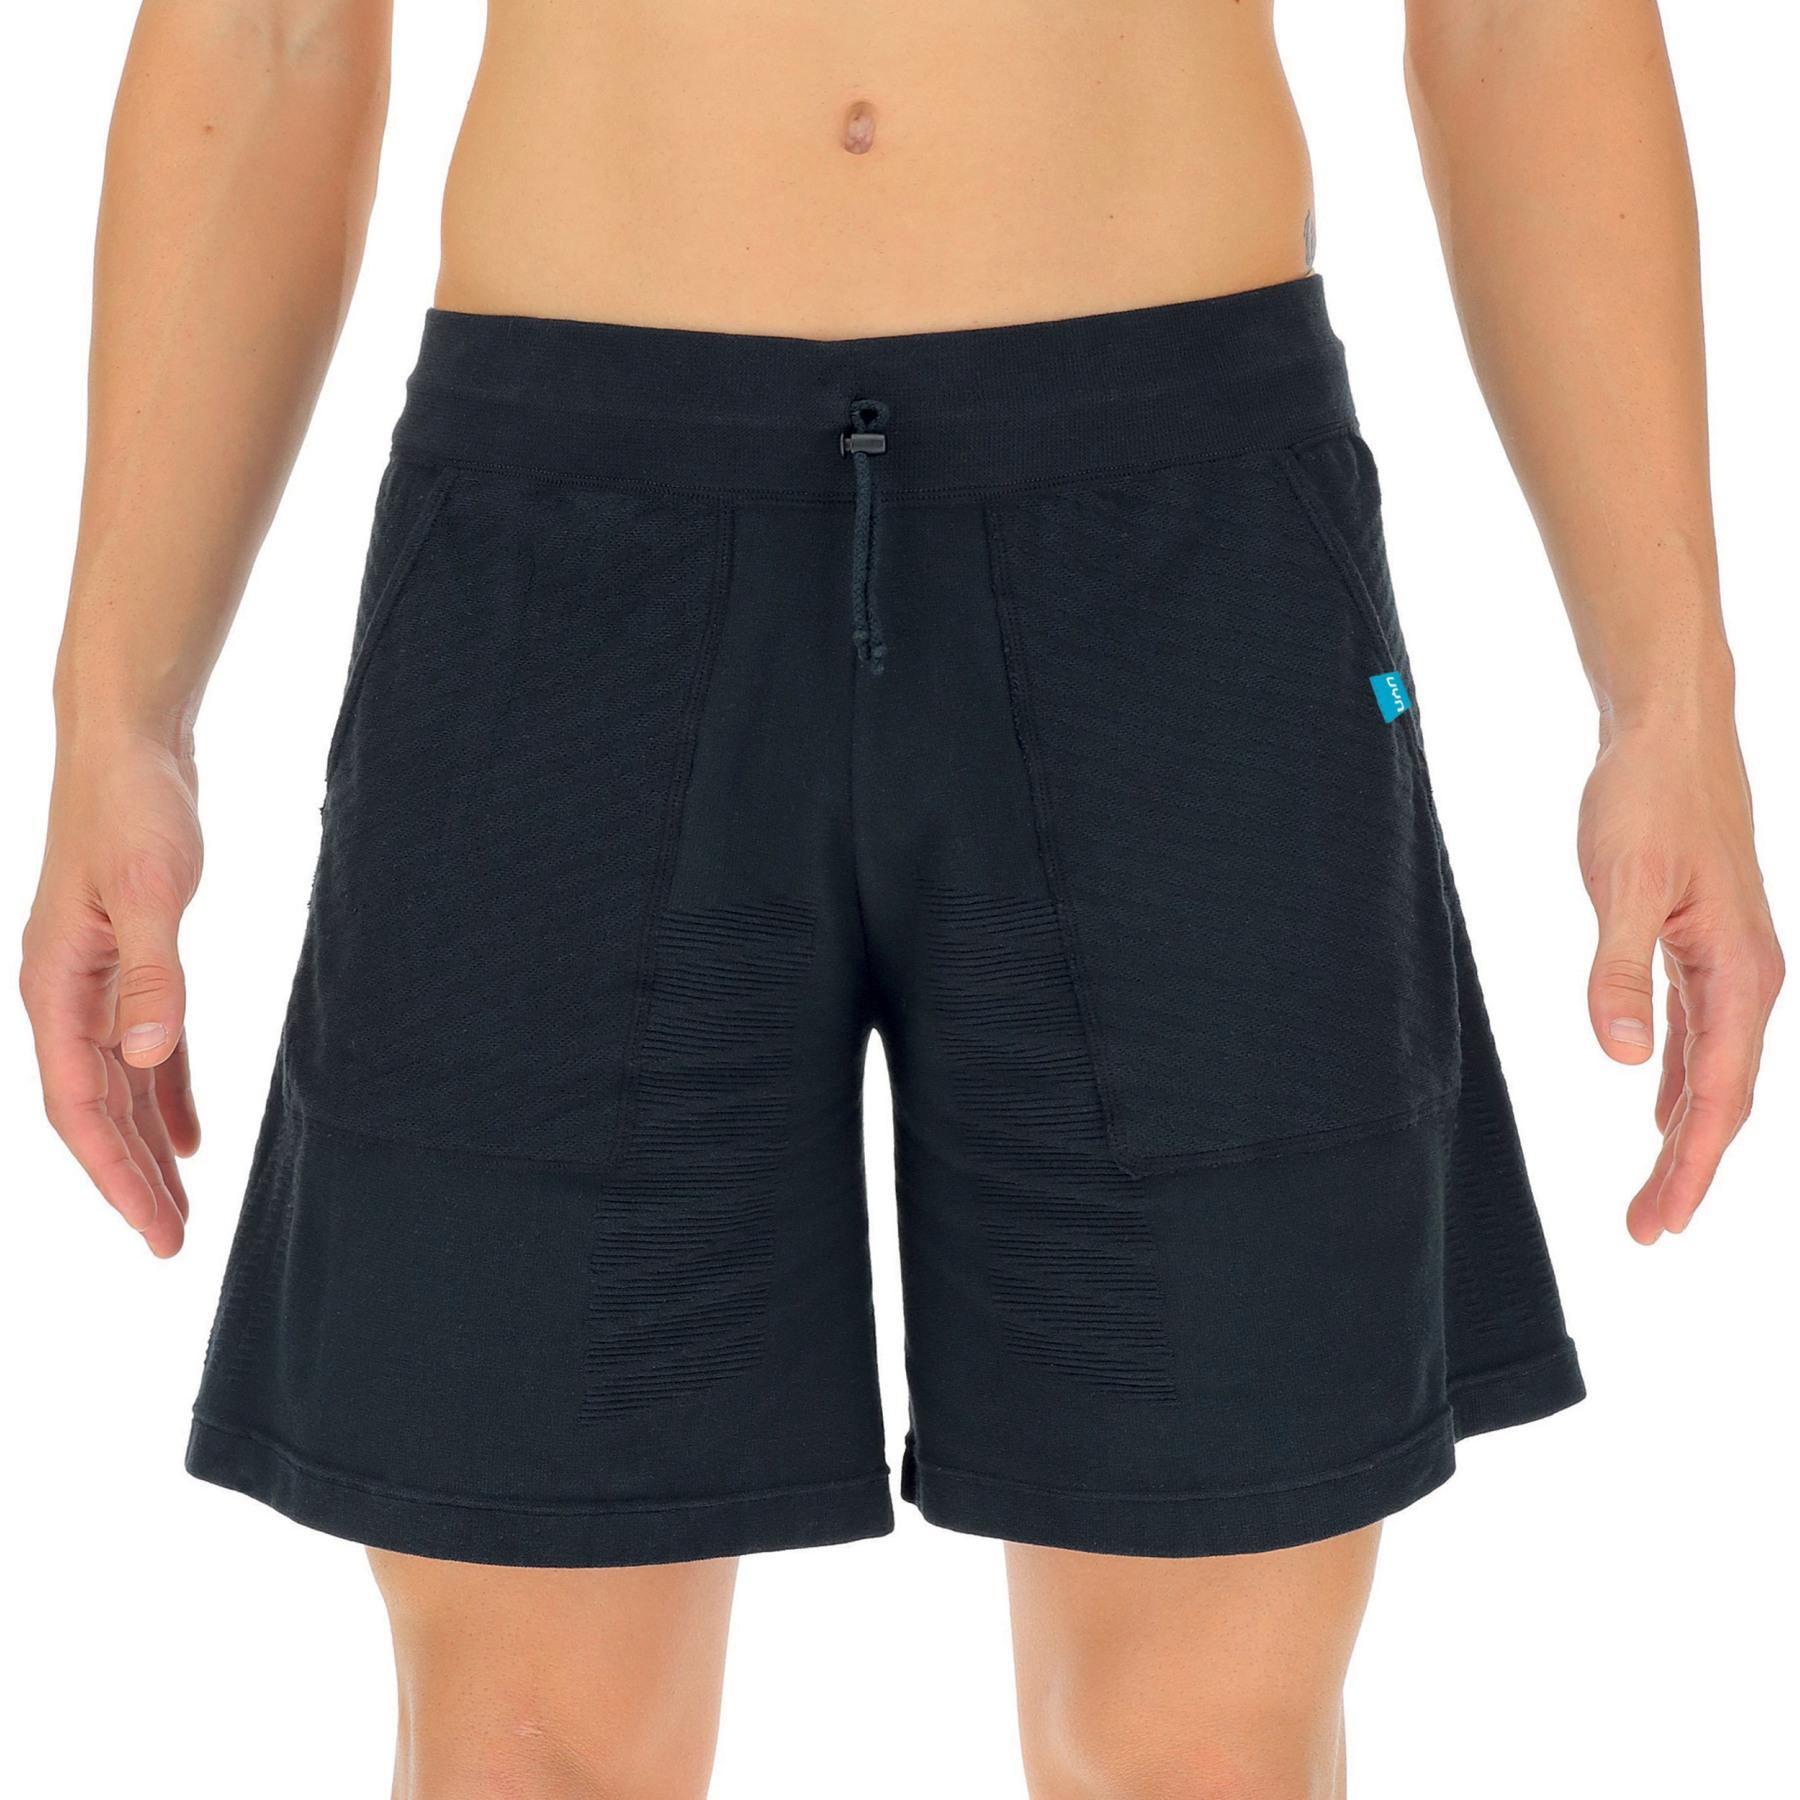 UYN Natural Training Shorts - Blackboard